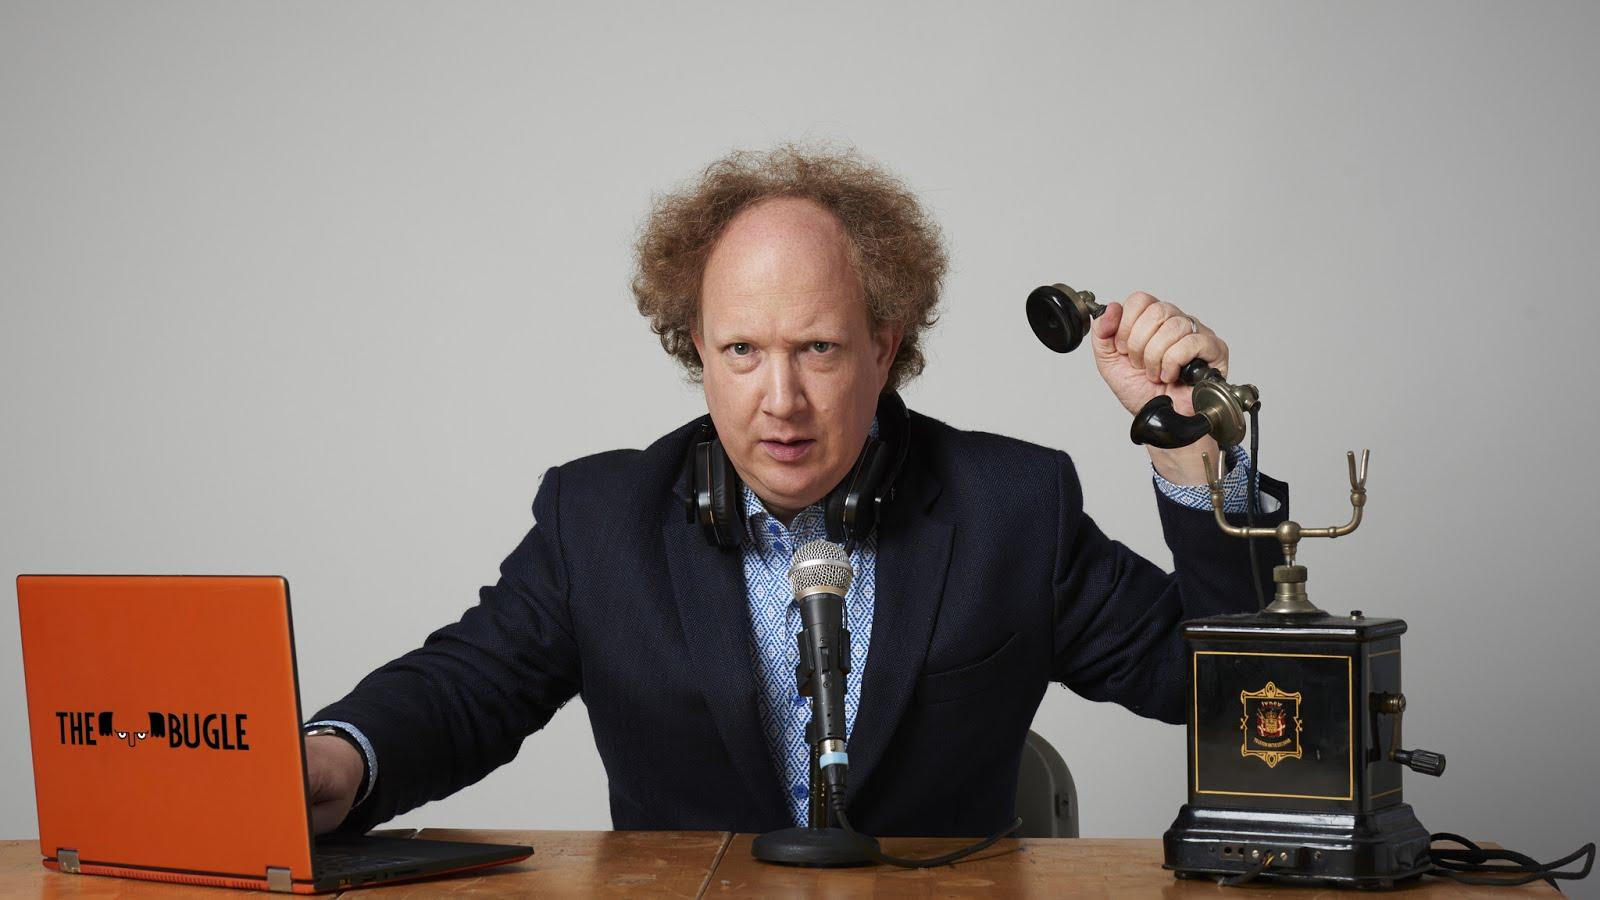 Satirist propagandist for hire